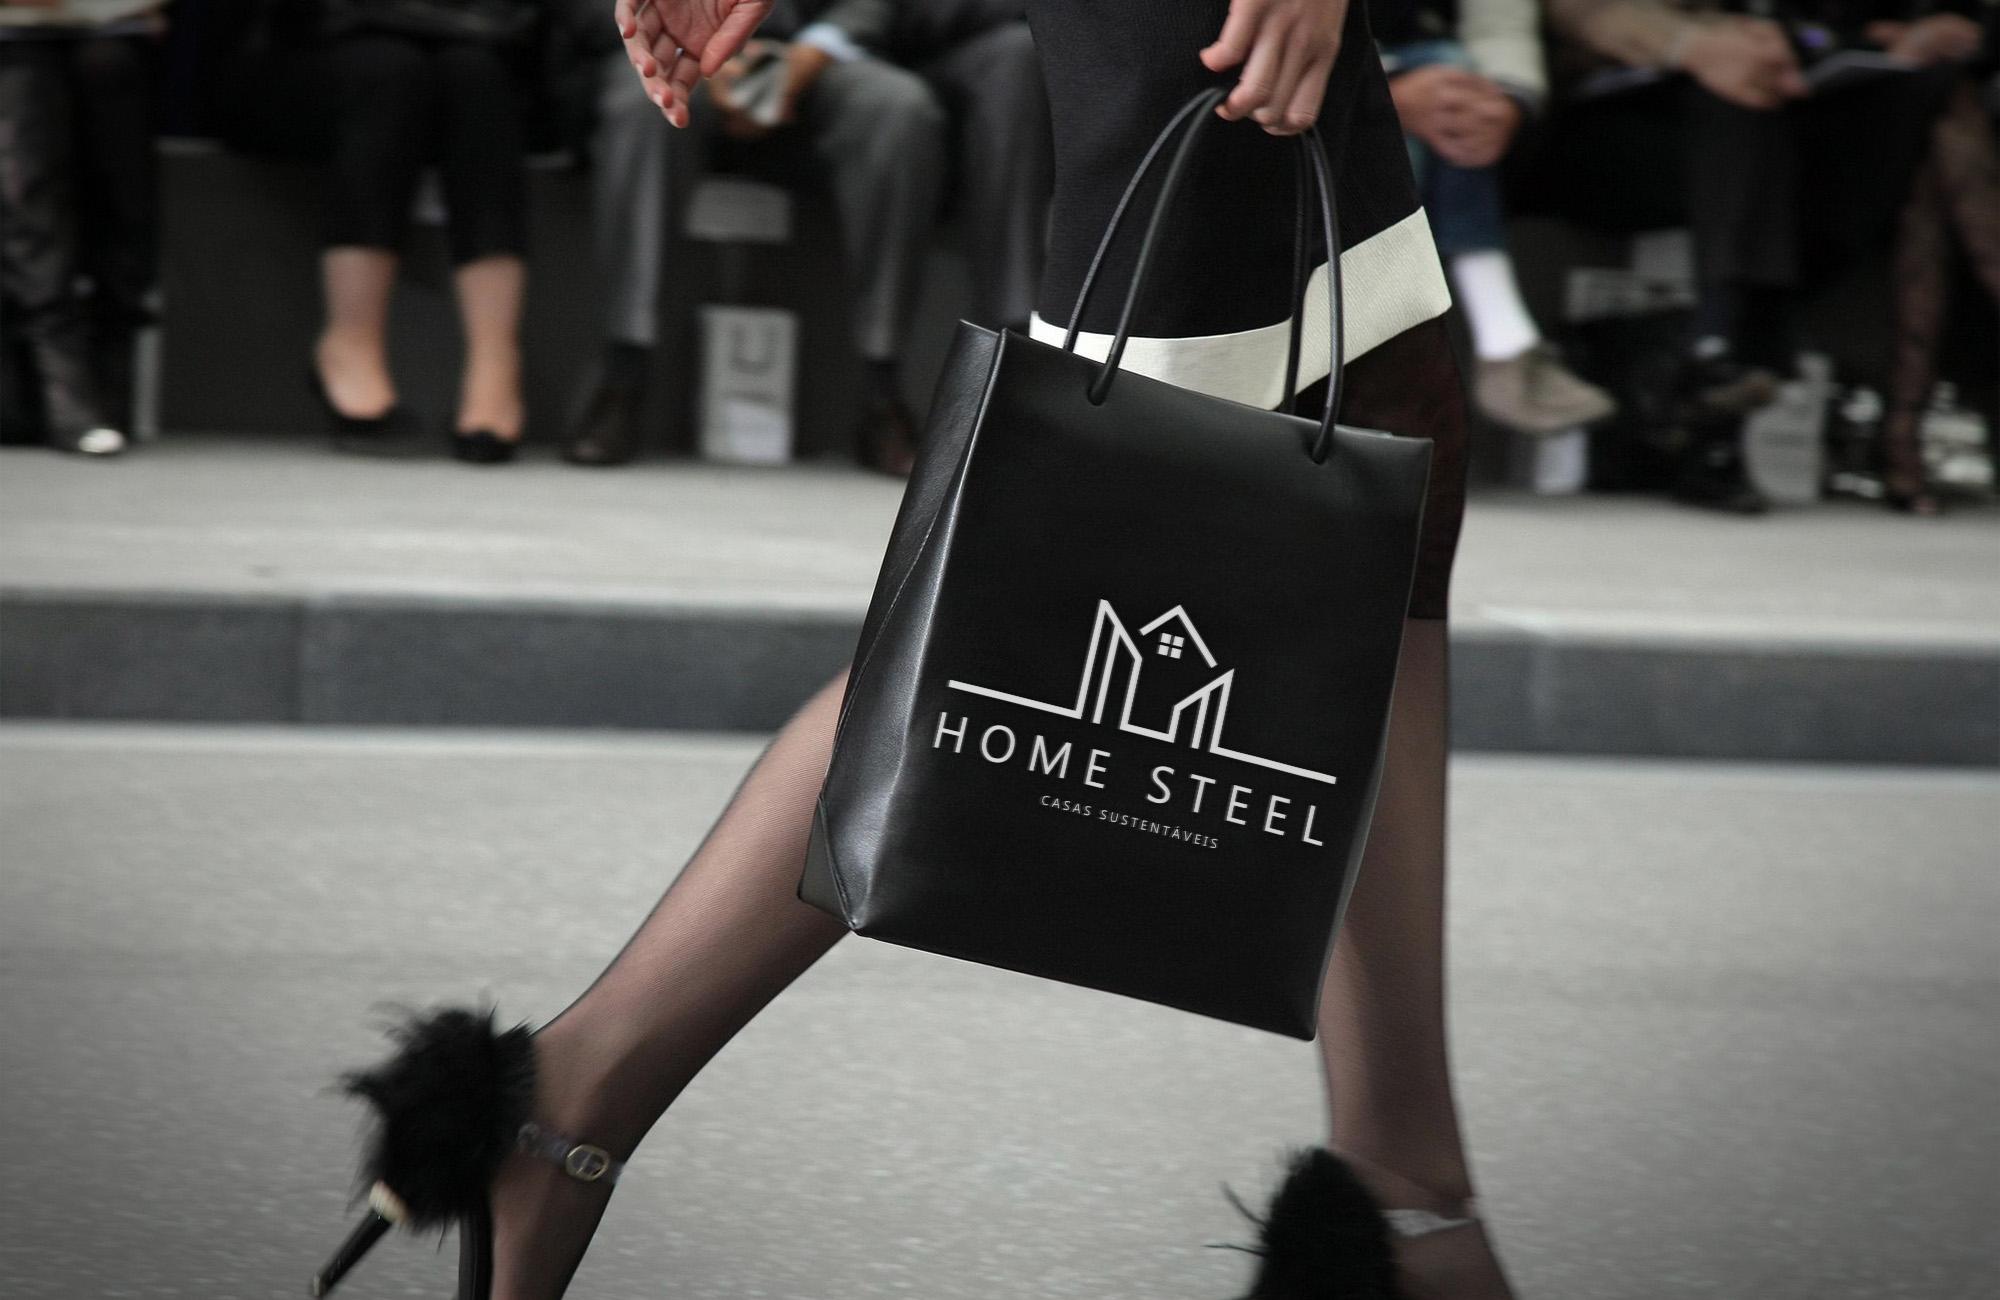 Home Steel